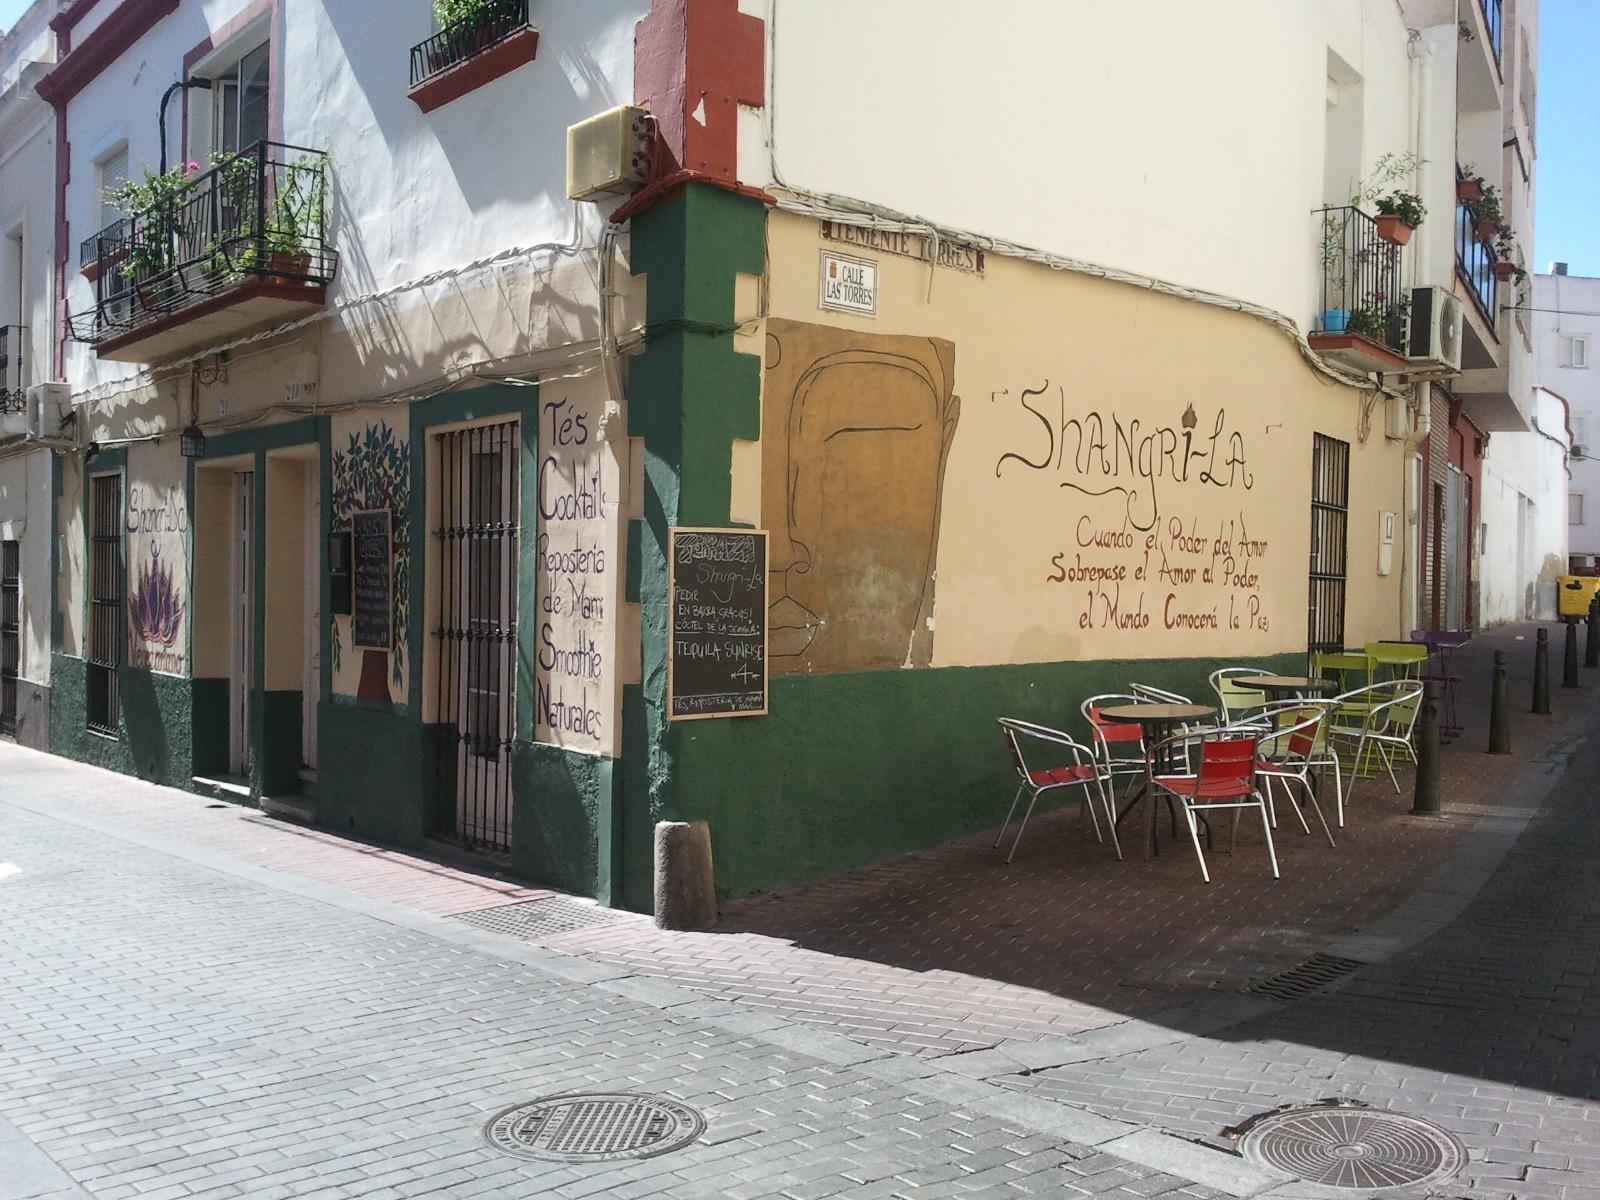 Shangri-La - Restaurante Vegetariano